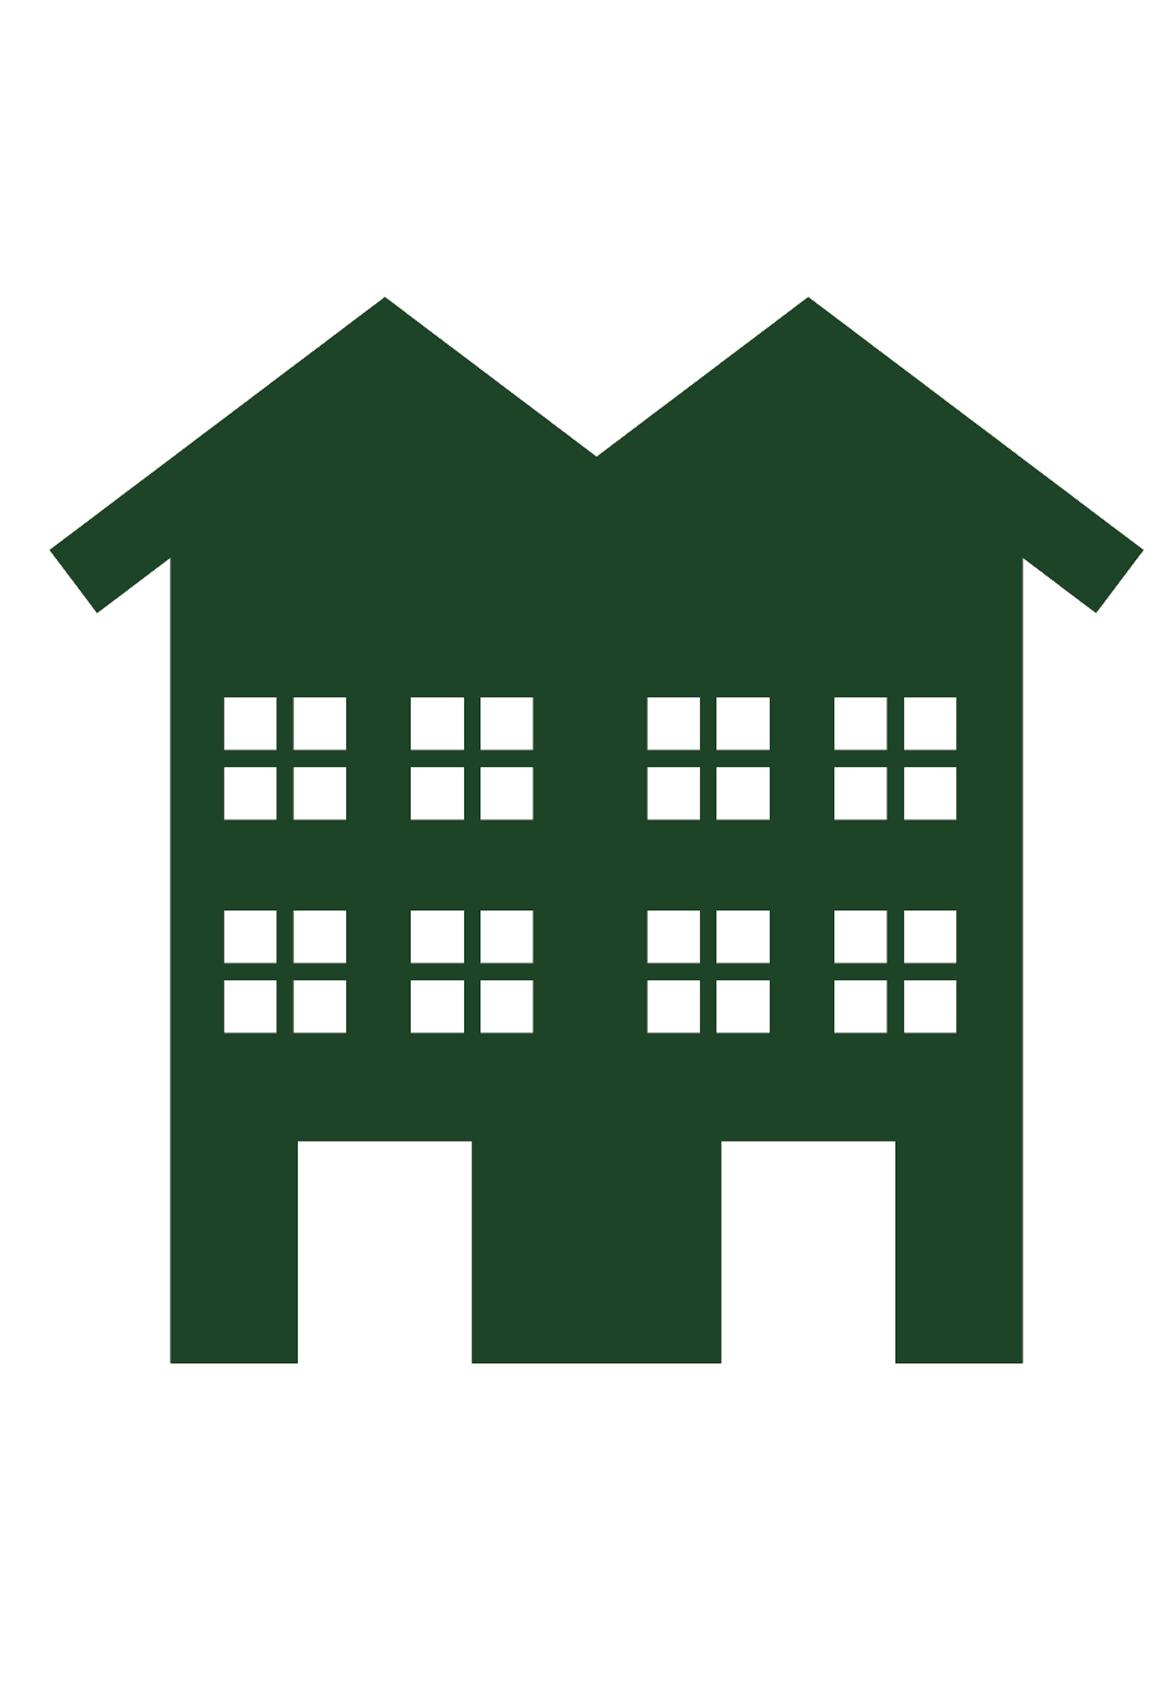 house_icon_gh3